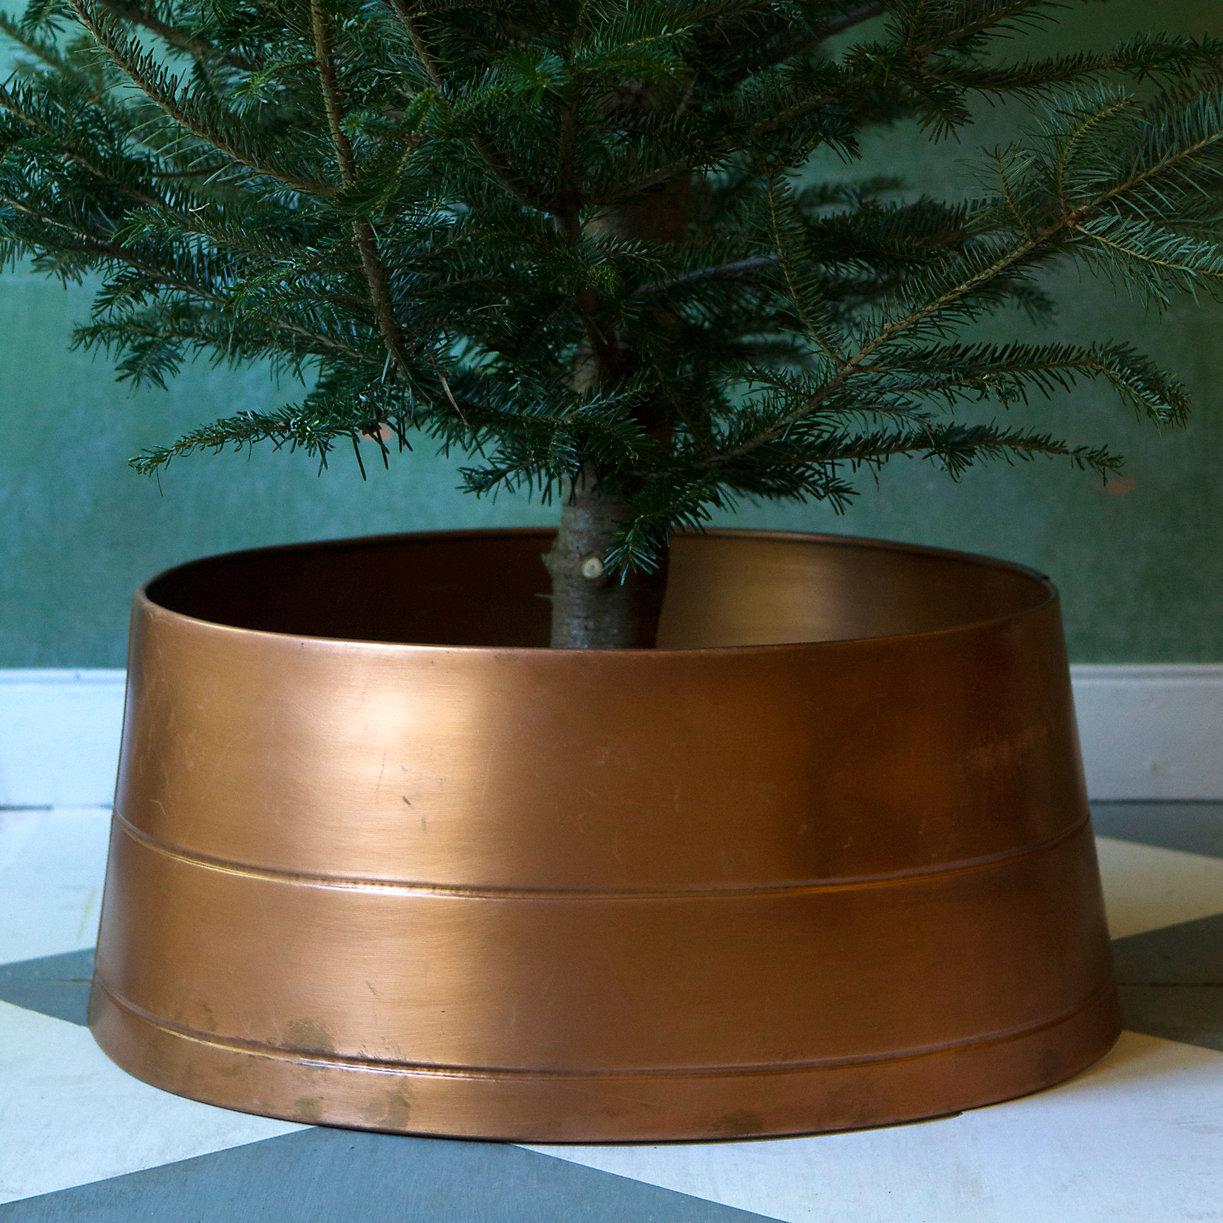 Copper Tree Skirt Terrain : 33053901000azoom2 from www.shopterrain.com size 1223 x 1223 jpeg 329kB